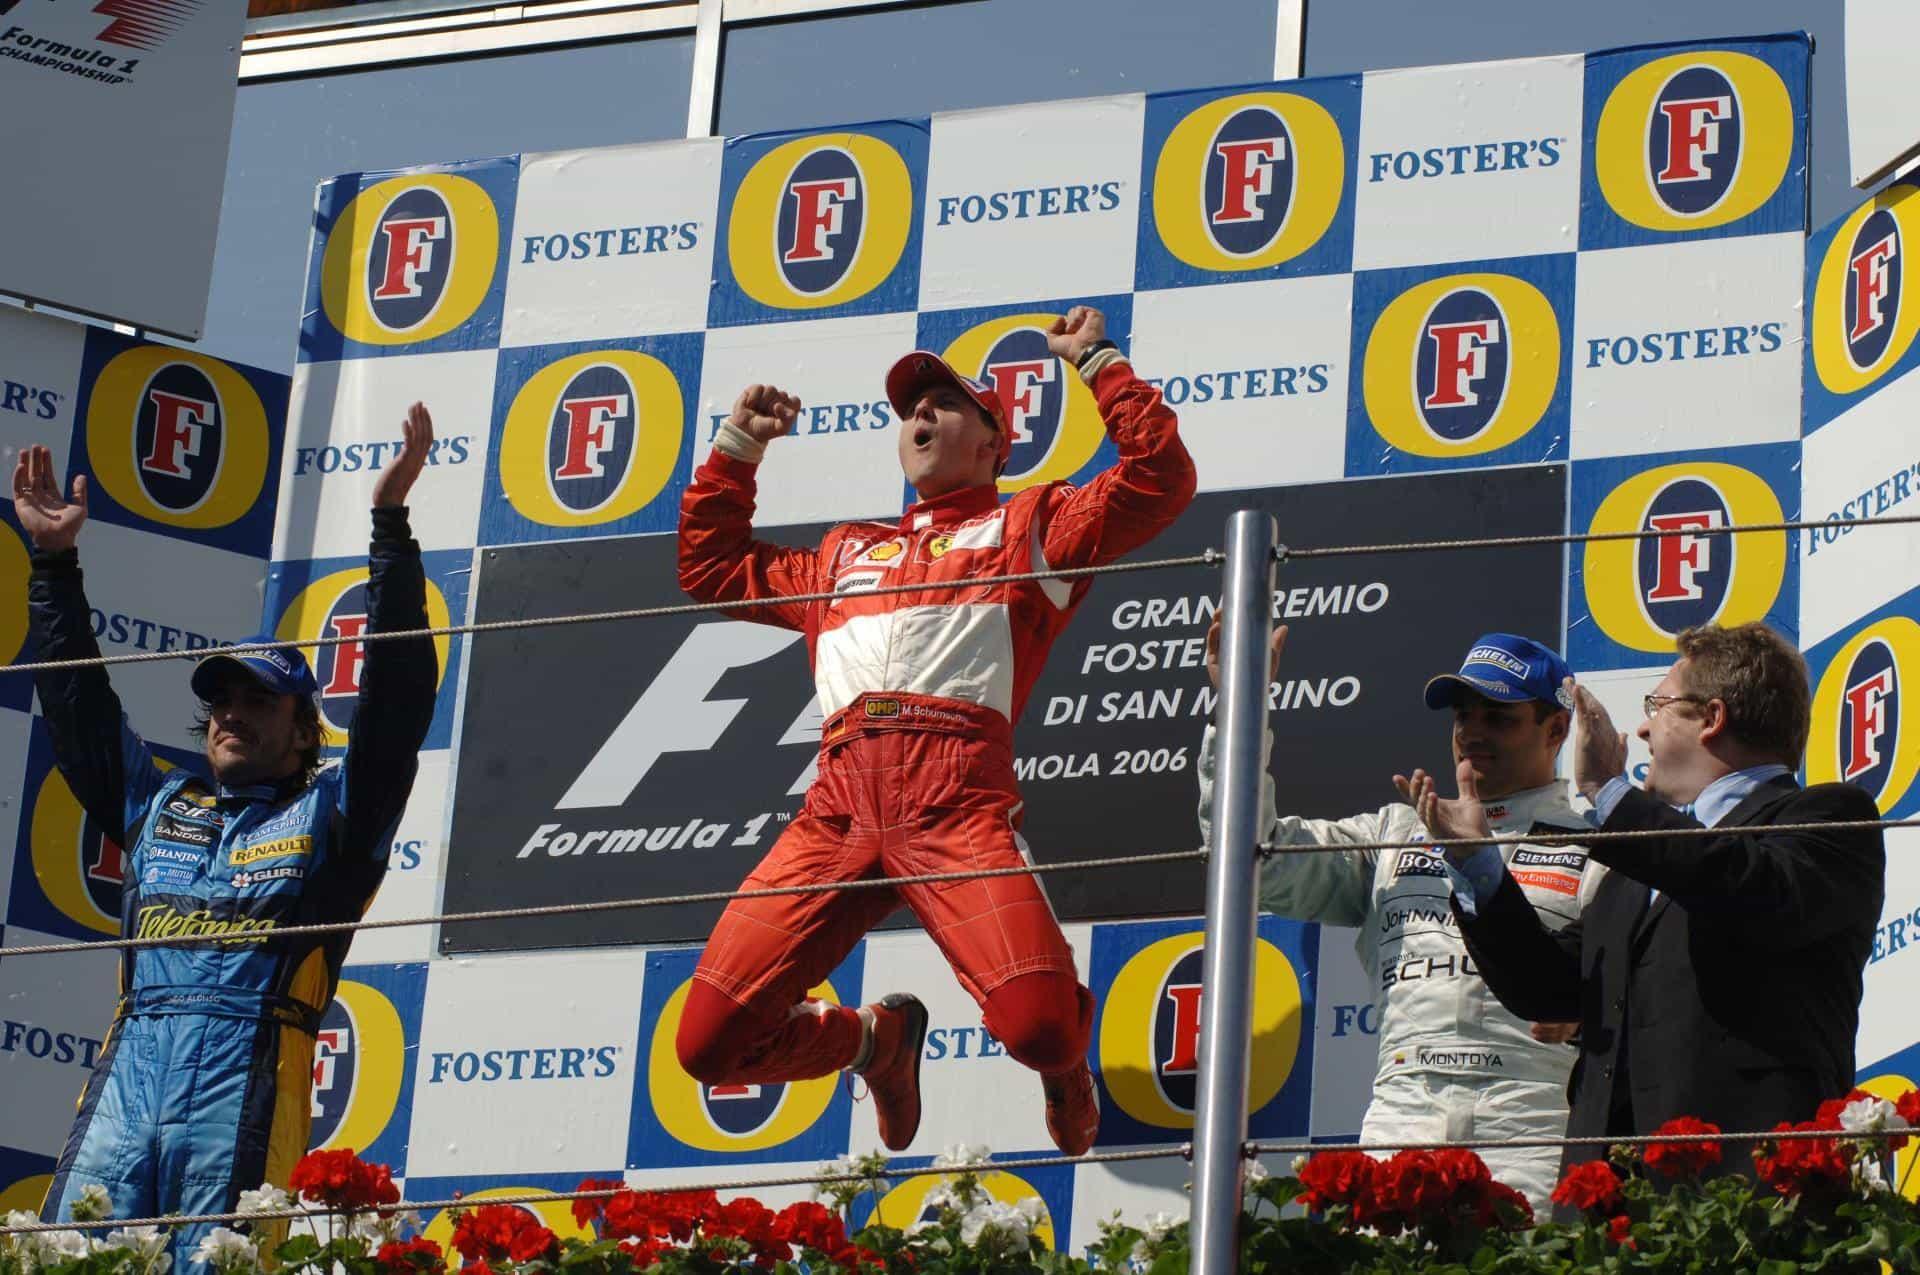 GRAND PRIX D'ÉMILIE-ROMAGNE 2020 — Formula 1 Emirates Gran Premio Dell'emilia Romagna 2020 San-Marino-Imola-F1-2006-podium-Foto-Ferrari